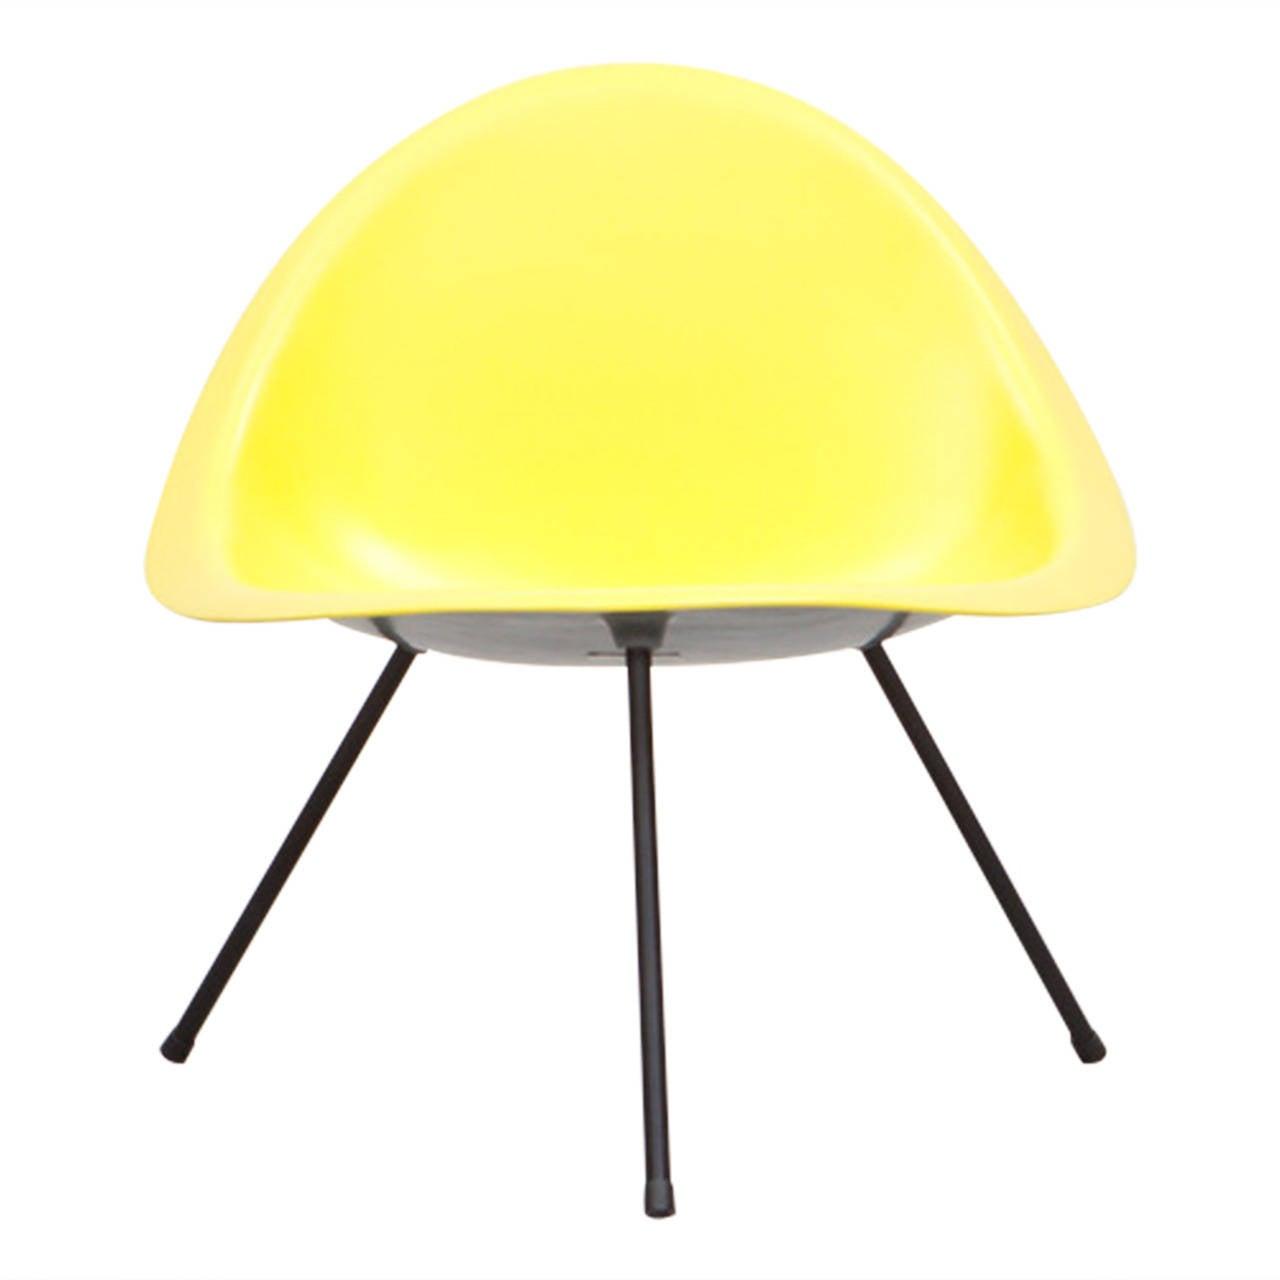 Poul Kjaerholm Aluminum Chair